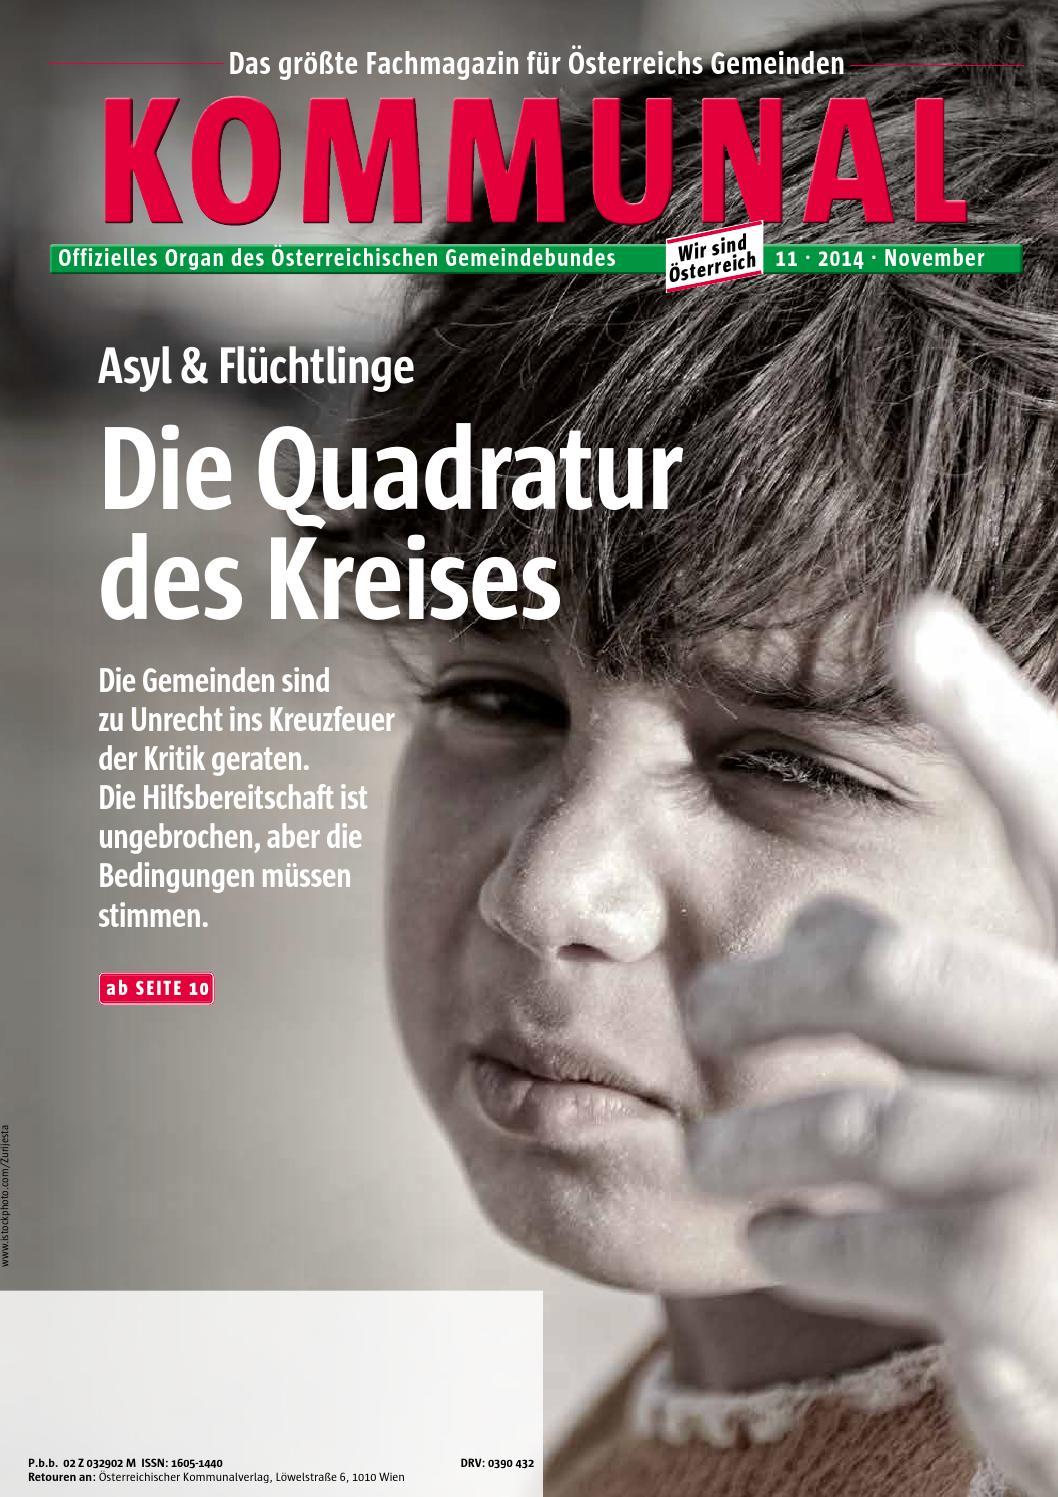 Kommunal 11/2014 (13 MB) by Gemeindebund - issuu